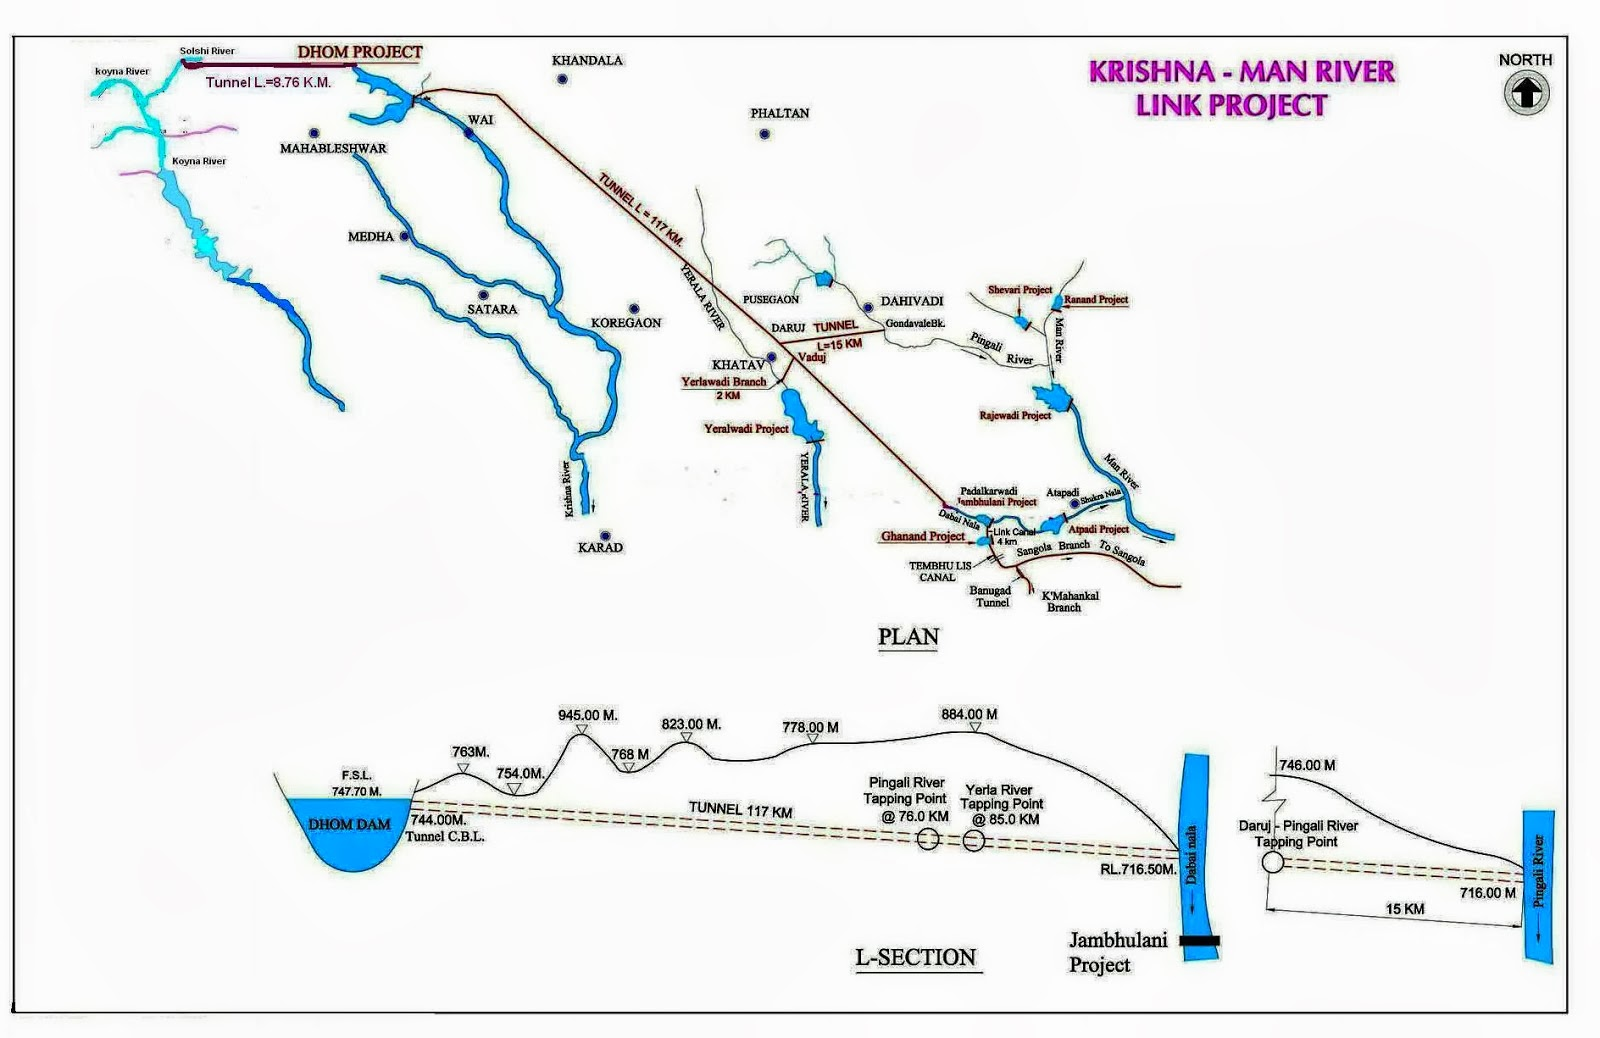 कृष्णा - माणगंगा नदी जोड प्रकल्पाचा संपूर्ण नकाशा  : L- Section Map